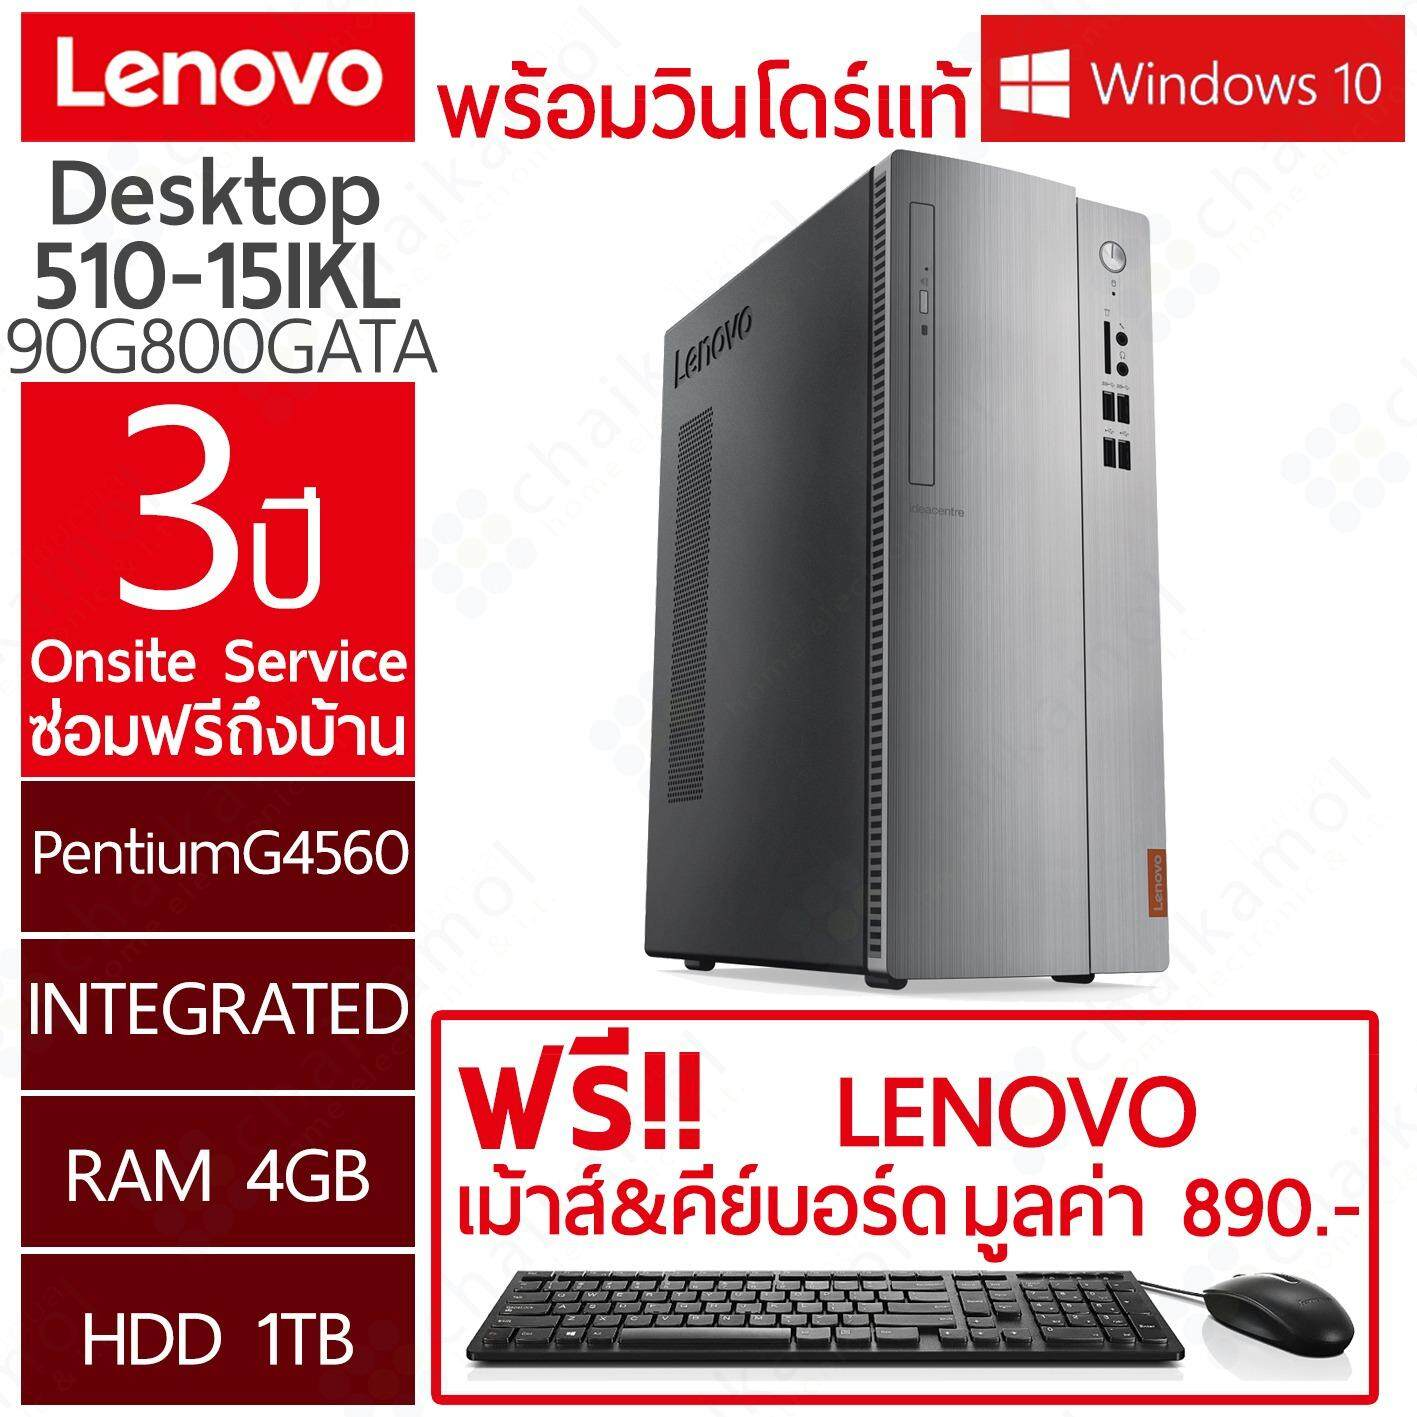 Lenovo PC IdeaCenter IC510-15IKL 90G800GATA Pentium G4560 / 4G / 1T / 3Y onsite